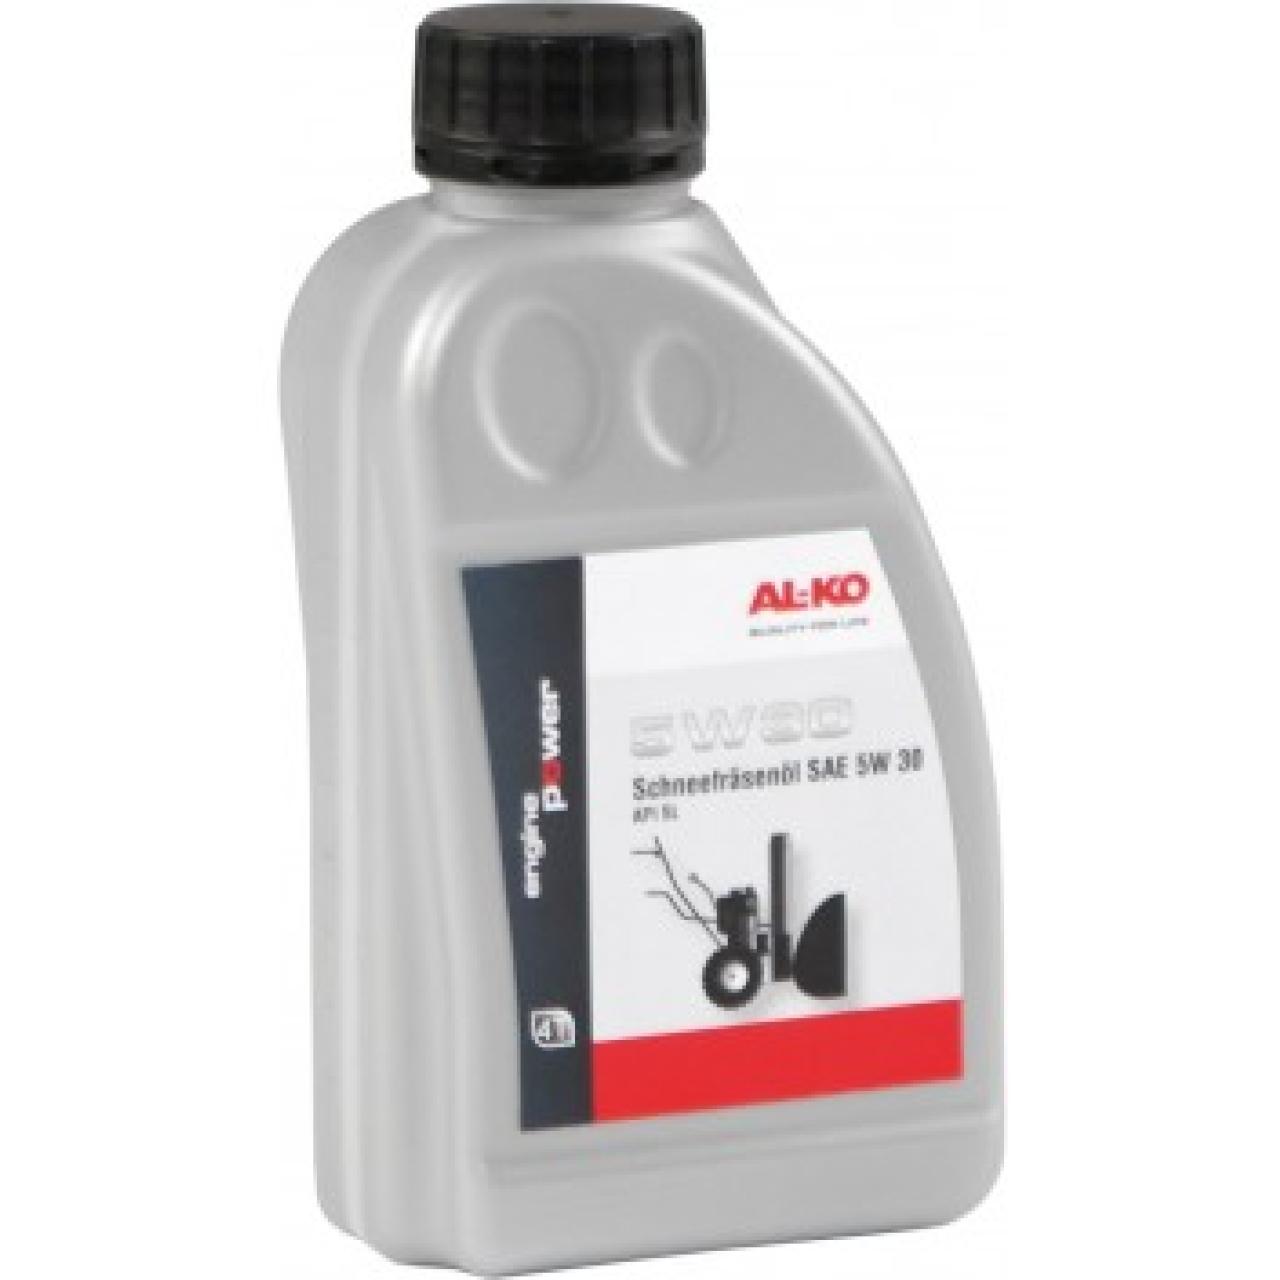 Schneefräsenöl 5W30 - 0,6 L